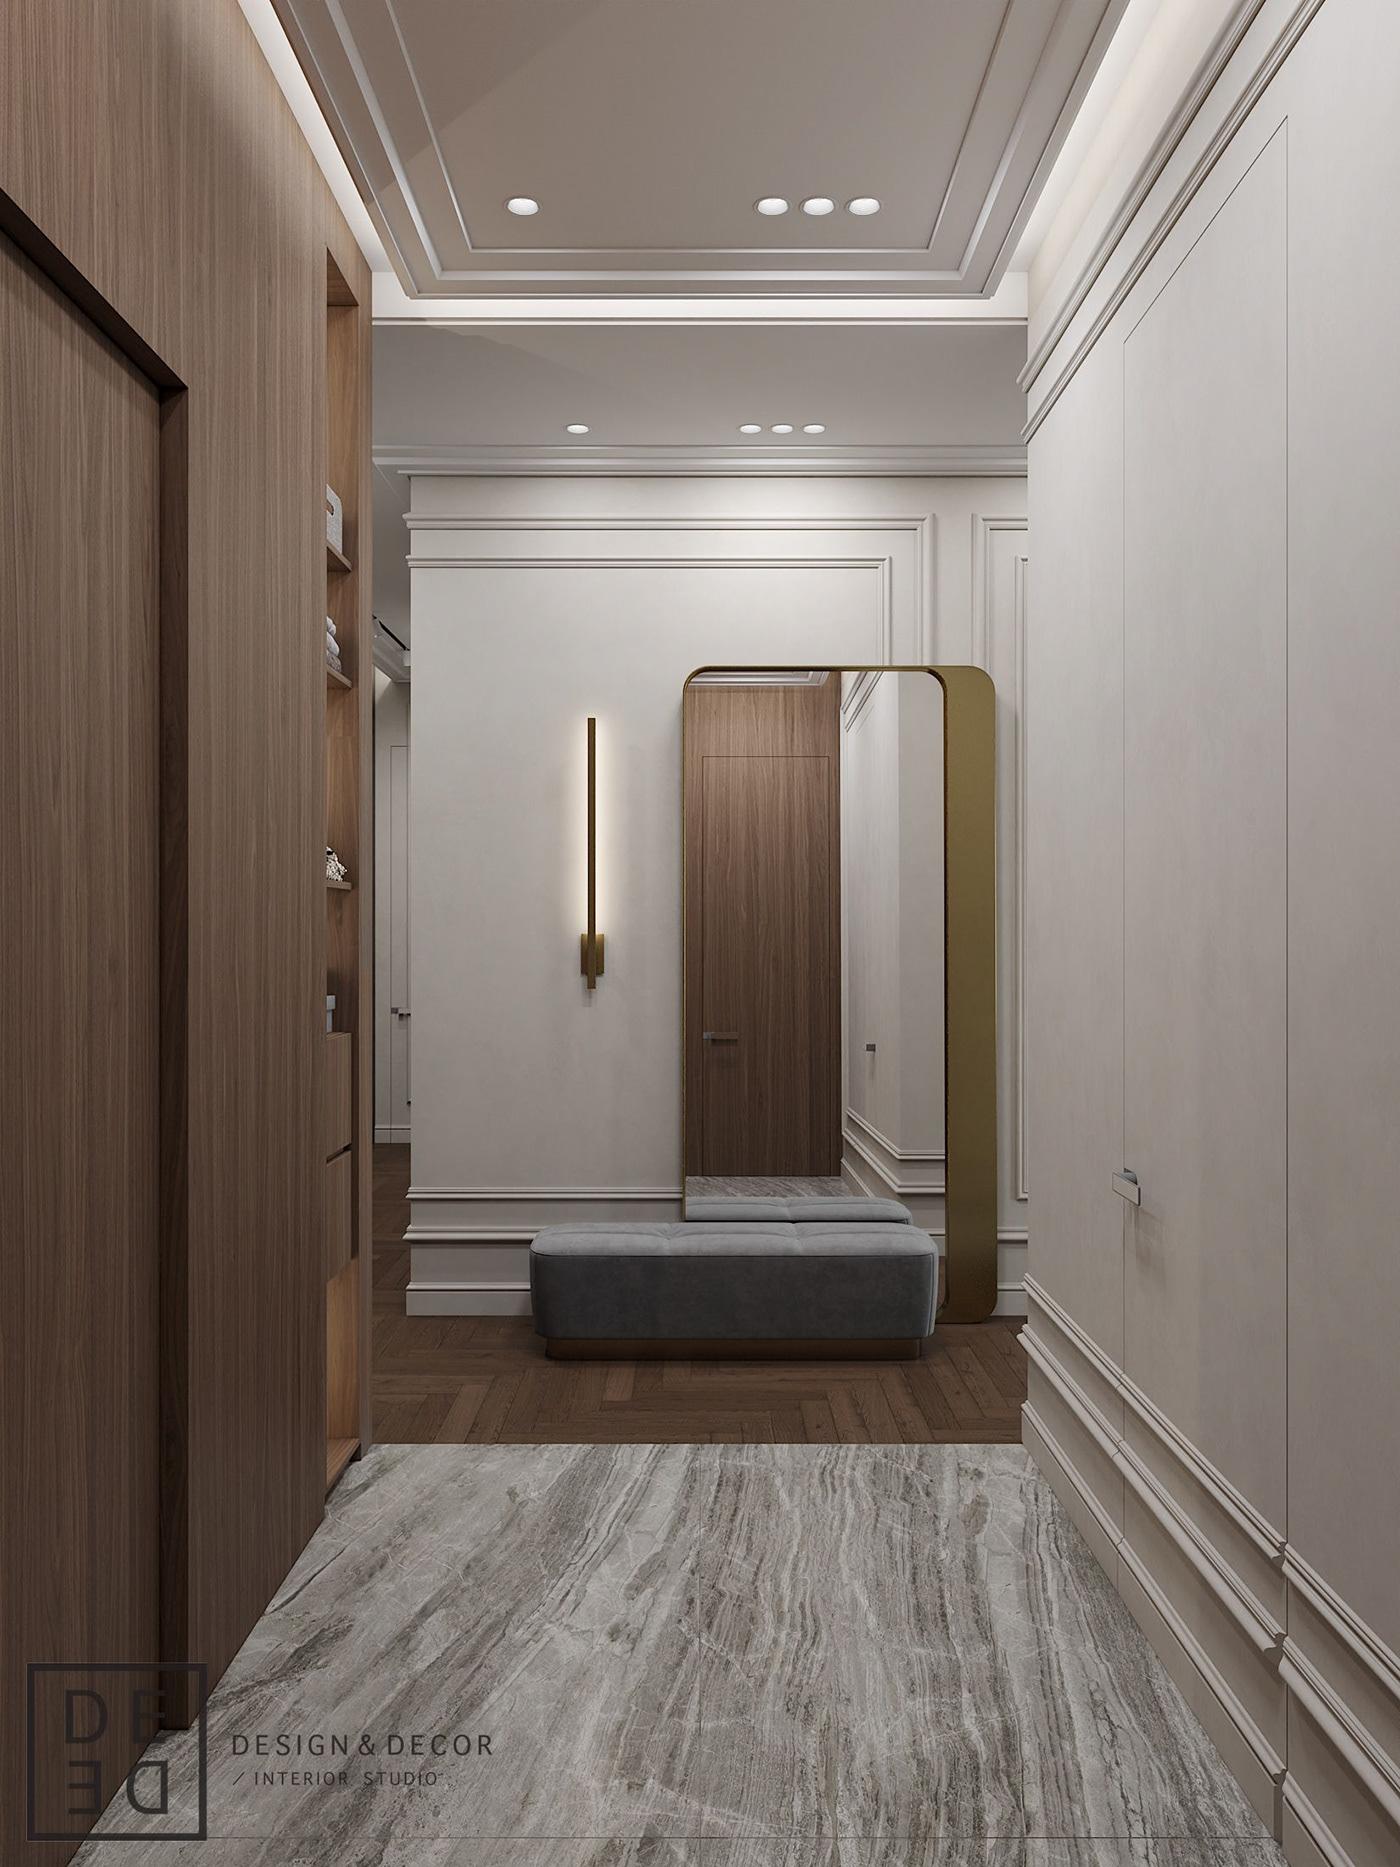 Interior design architecture interiordesign Minimalism modern CoronaRender  3dsmax photoshop DE&DE Interior Studio